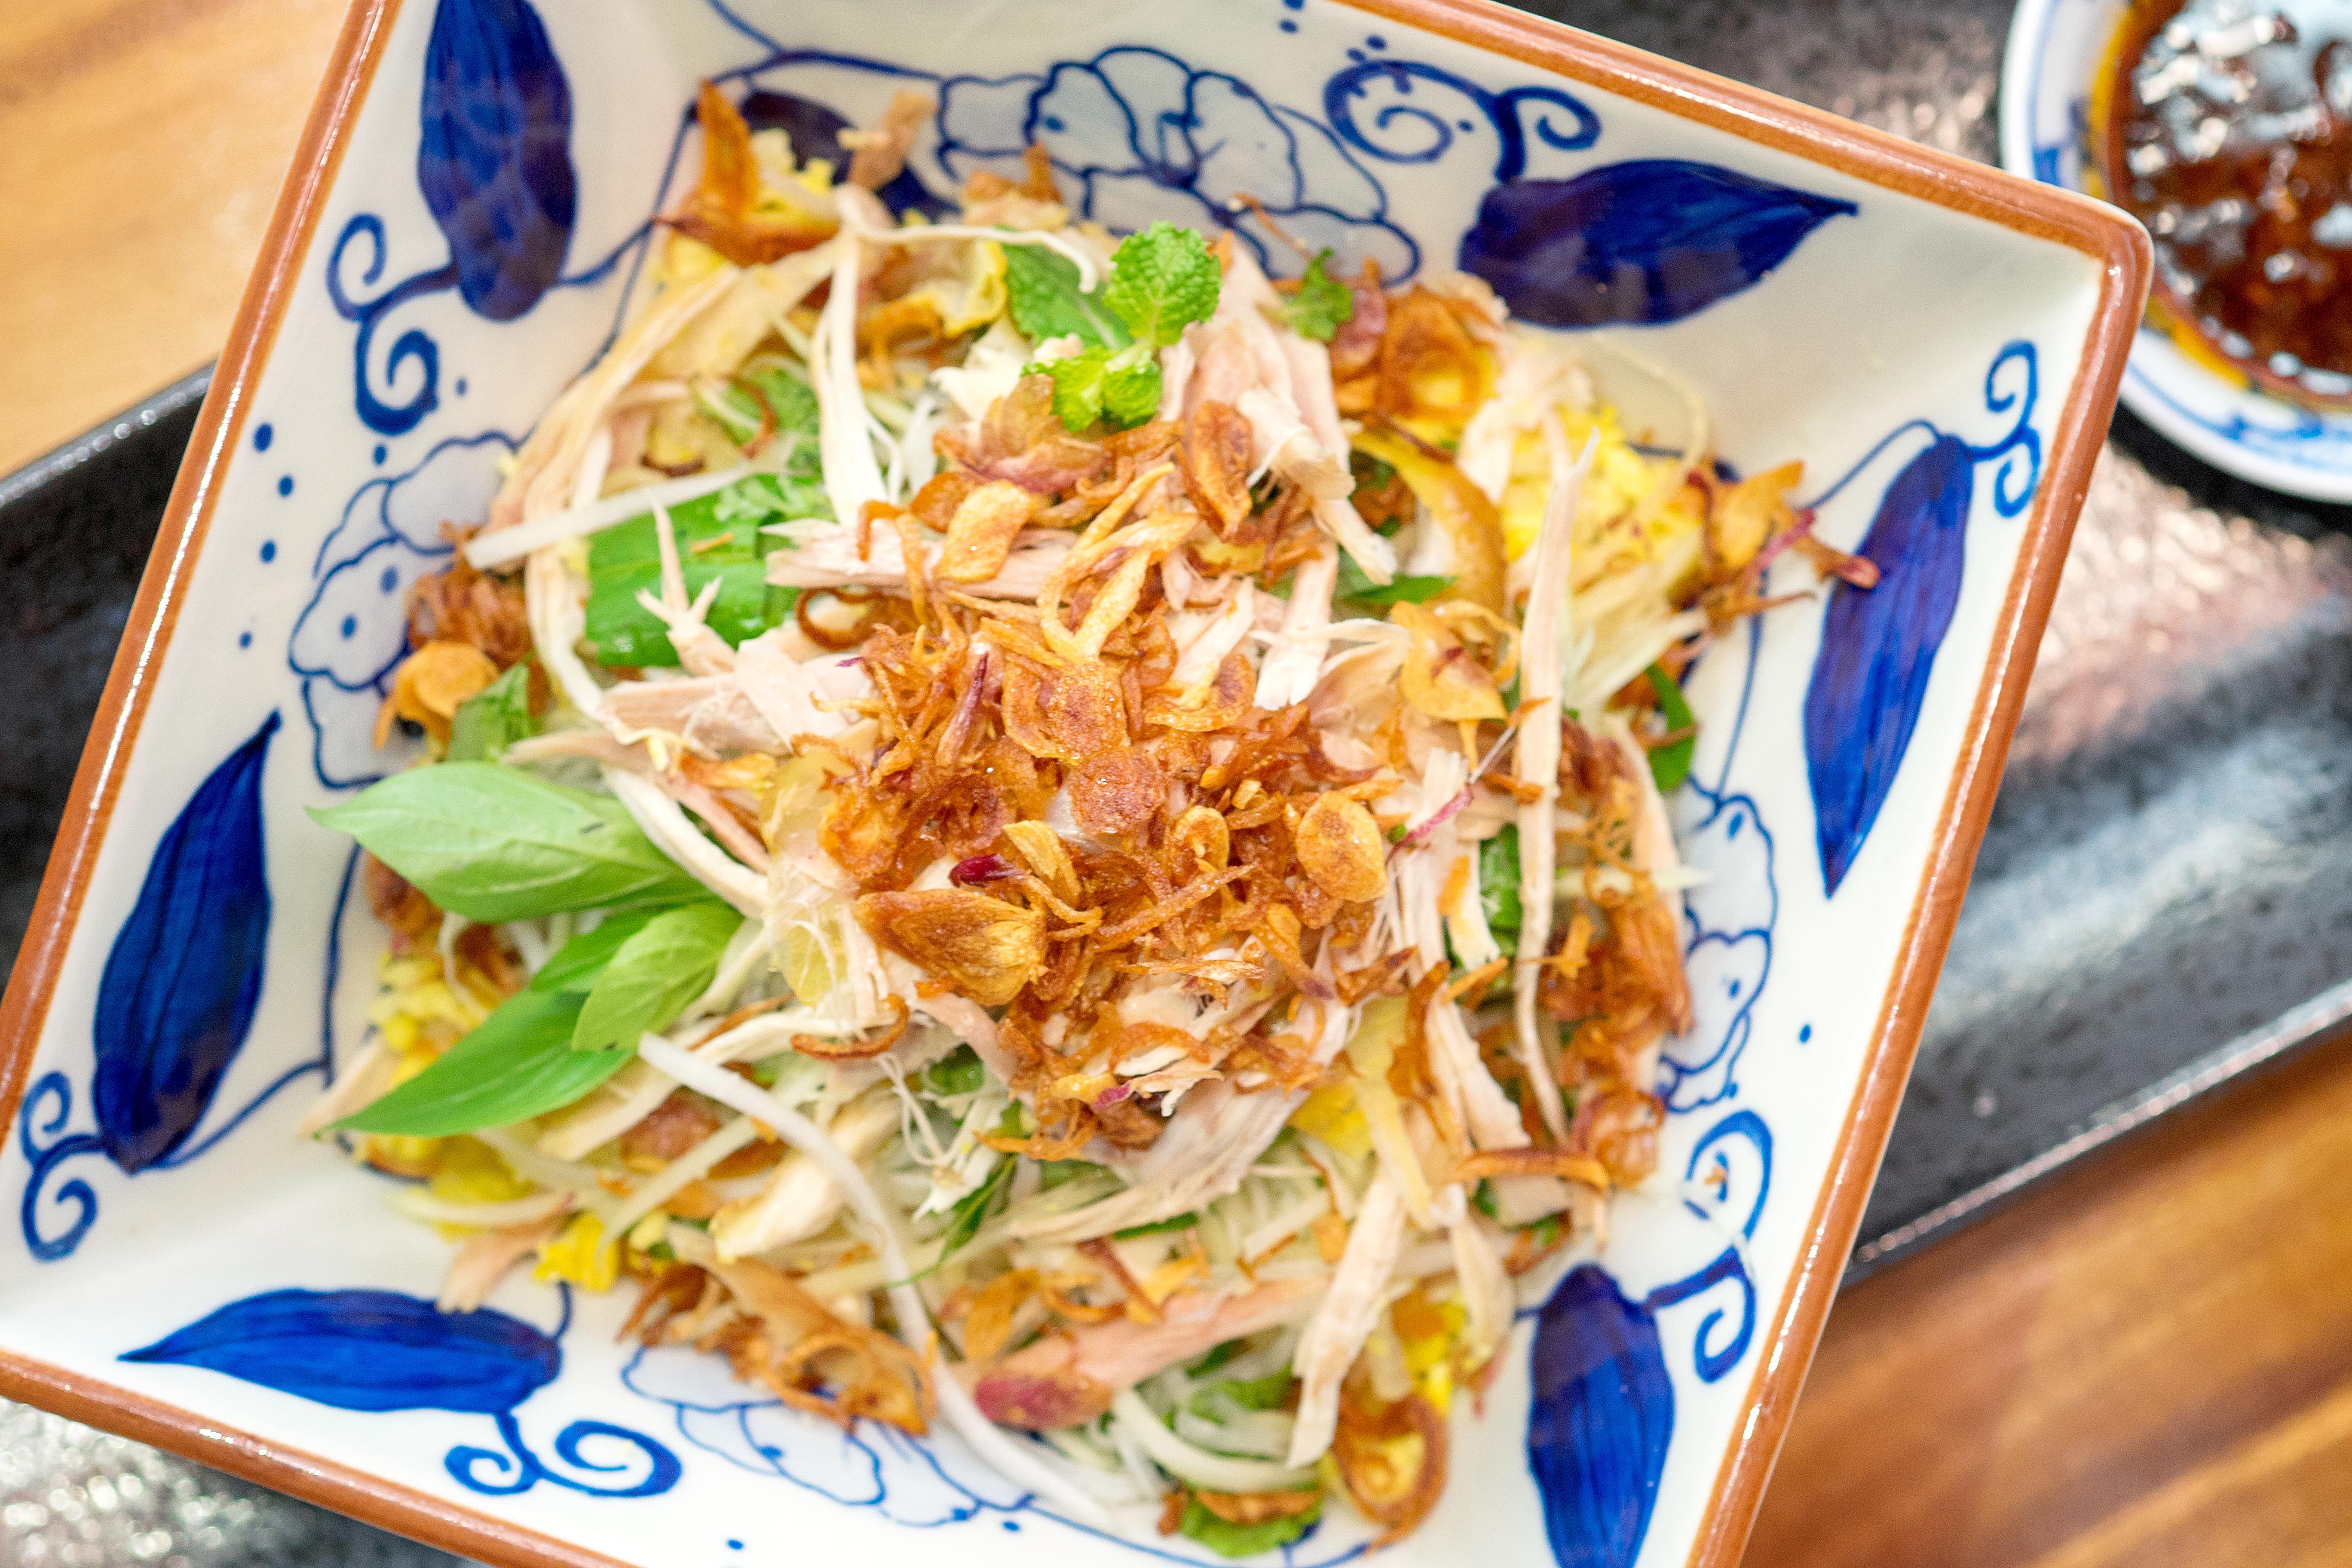 oi-vietnam-sep2016_thefishsauce_steamed-farm-raised-chicken-with-steamed-rice-mung-bean-onion-coriander-greens-_dsc9034_nt